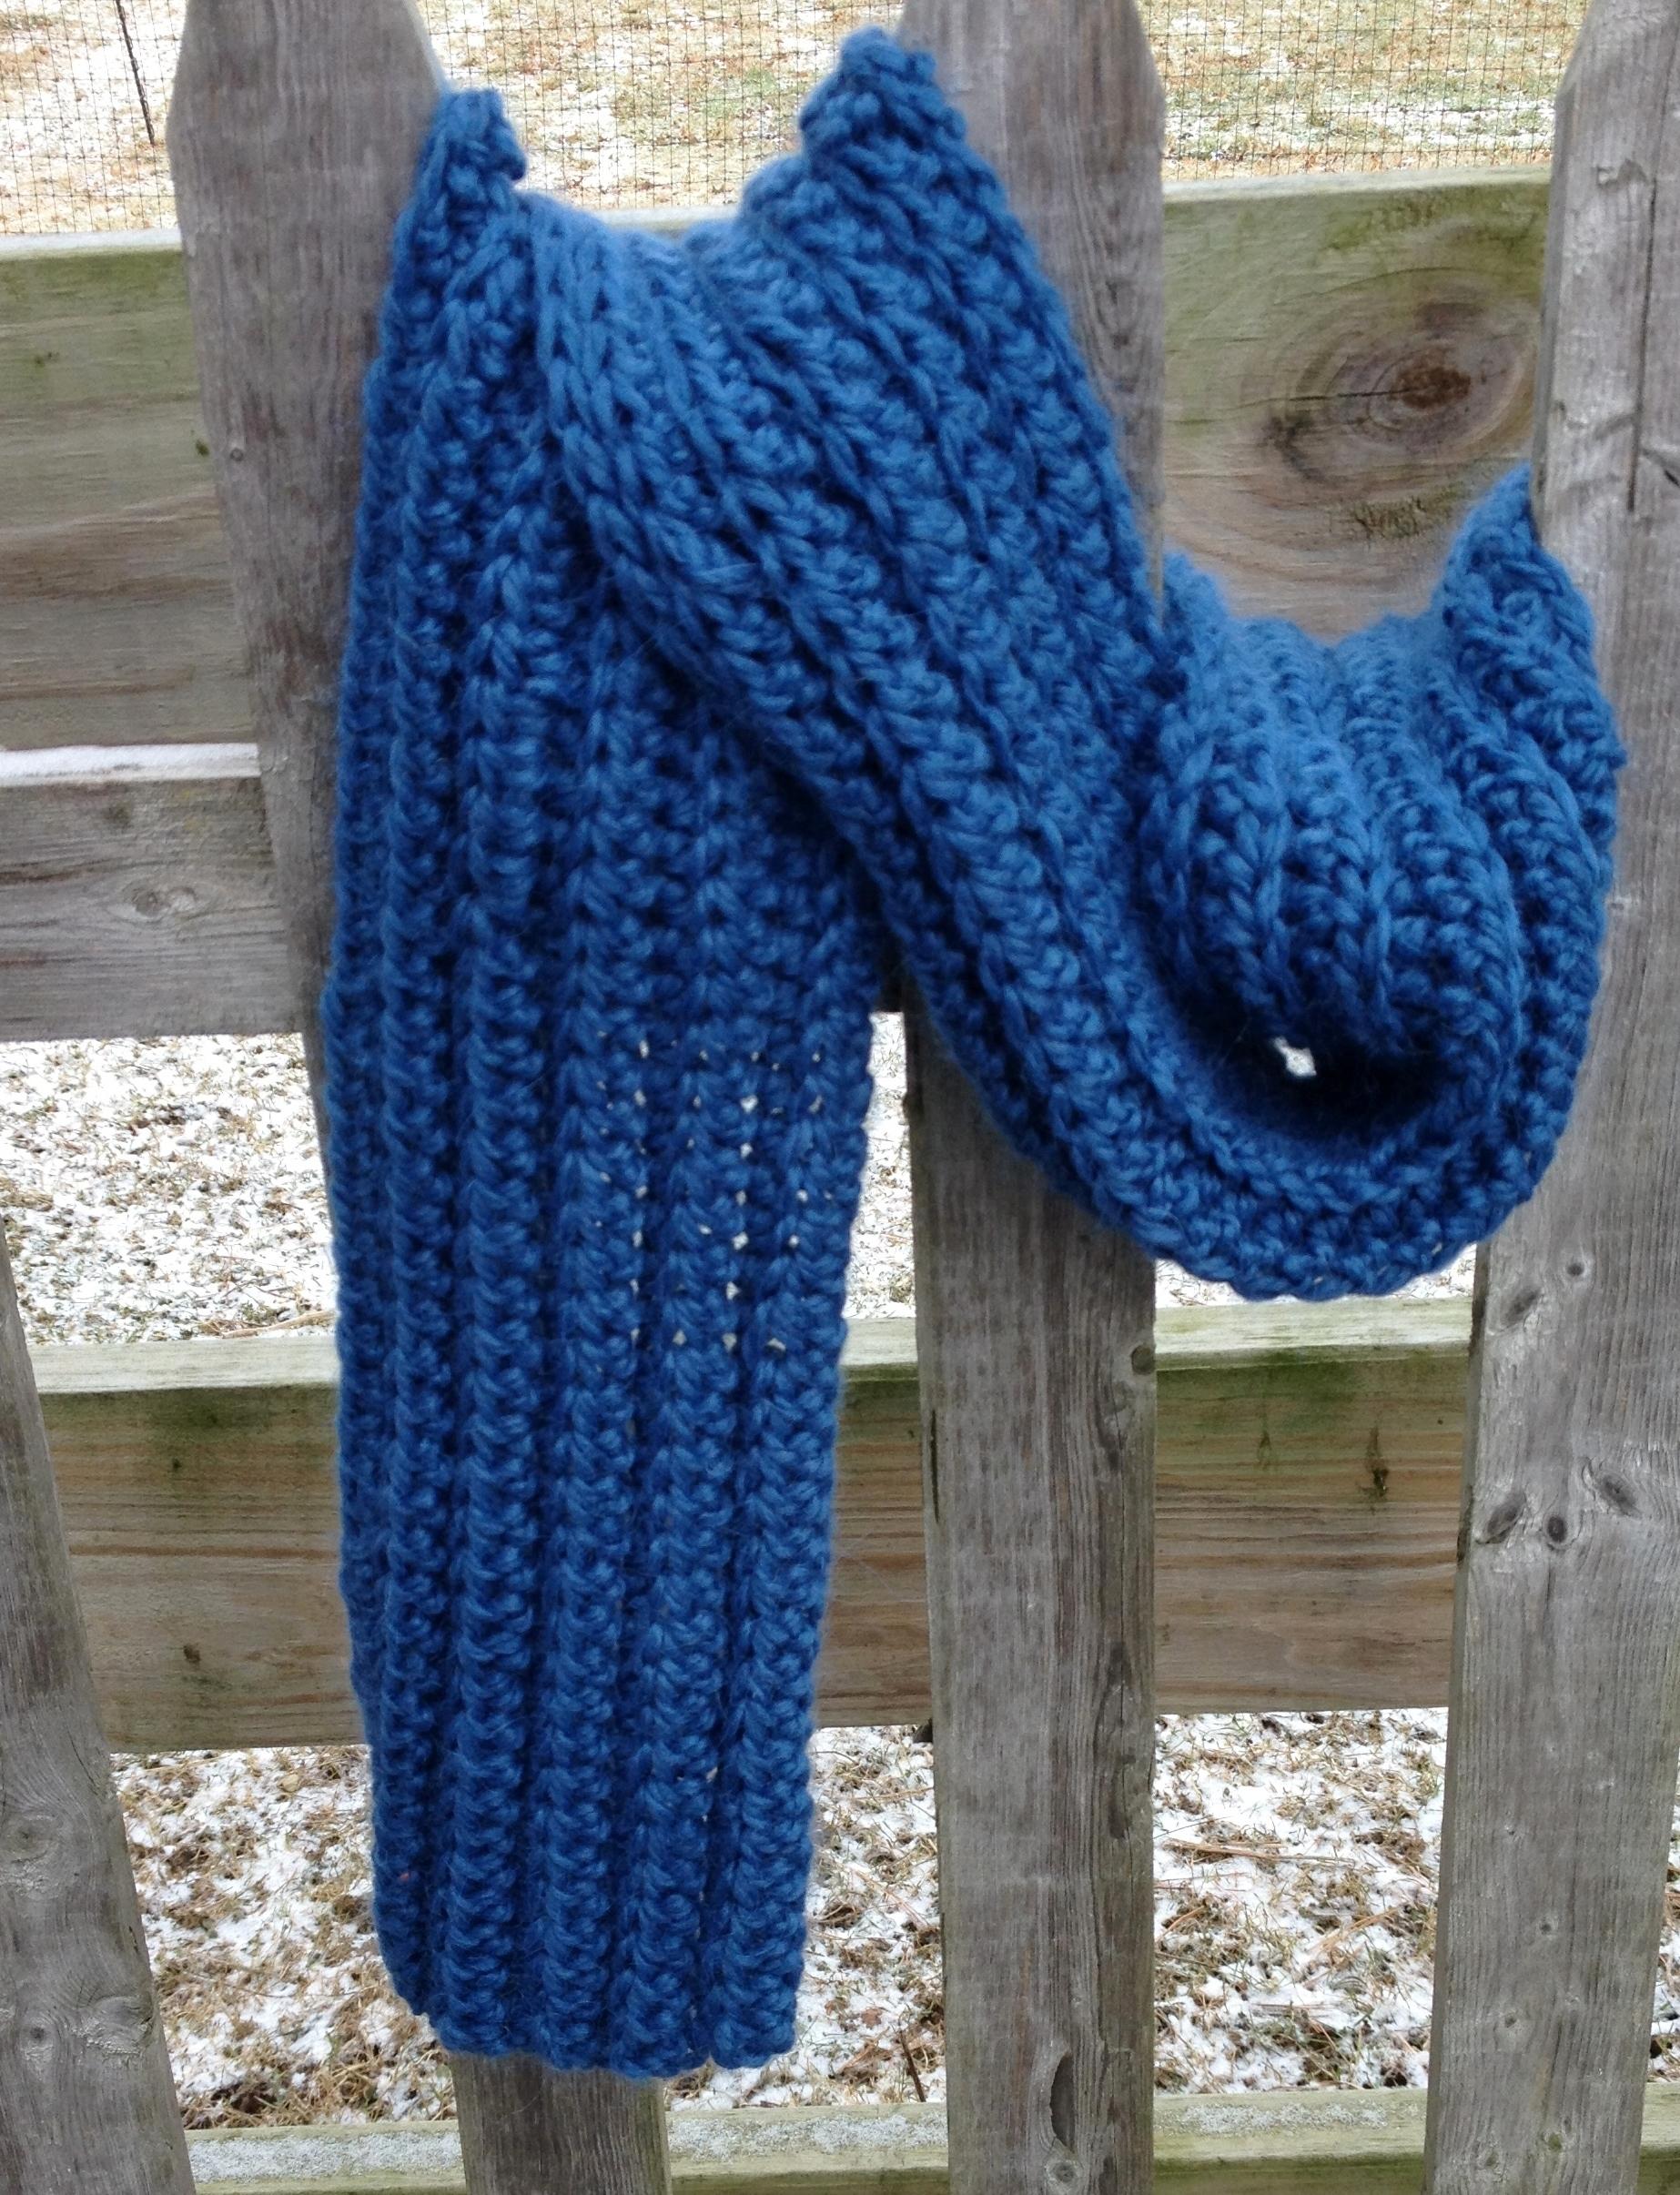 Bulky Ribbed Crochet Scarf 17699BulkRibCrScrf